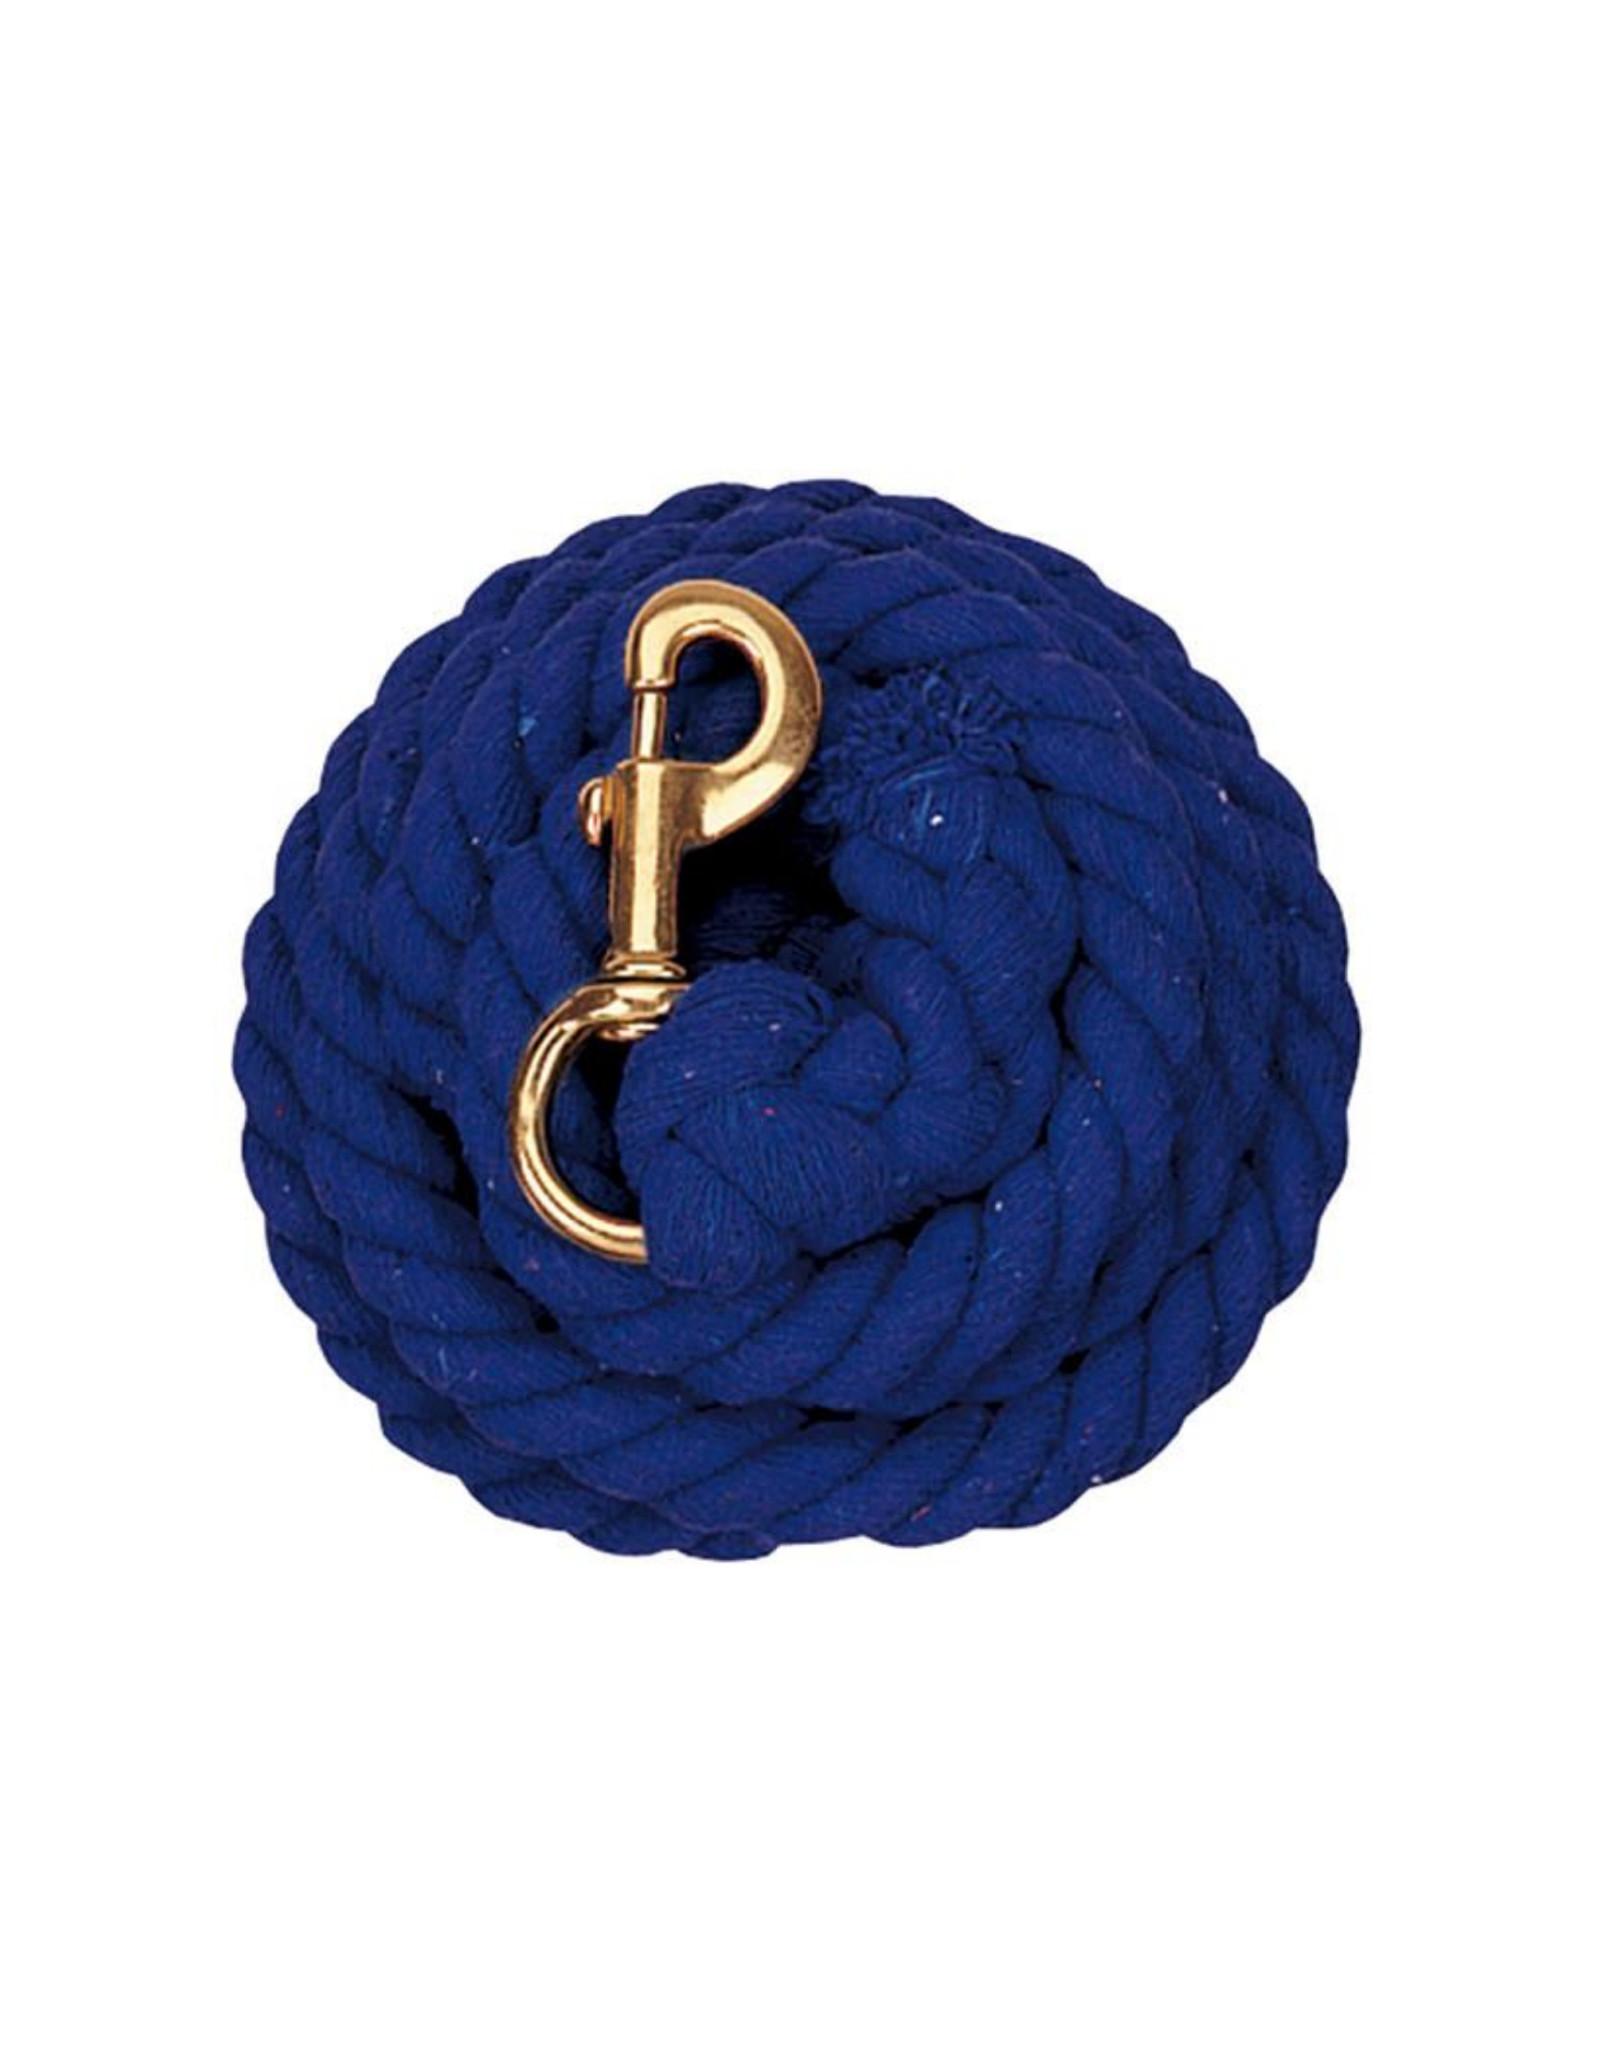 Weaver Lead Cotton SB WVR 5/8 X 10'